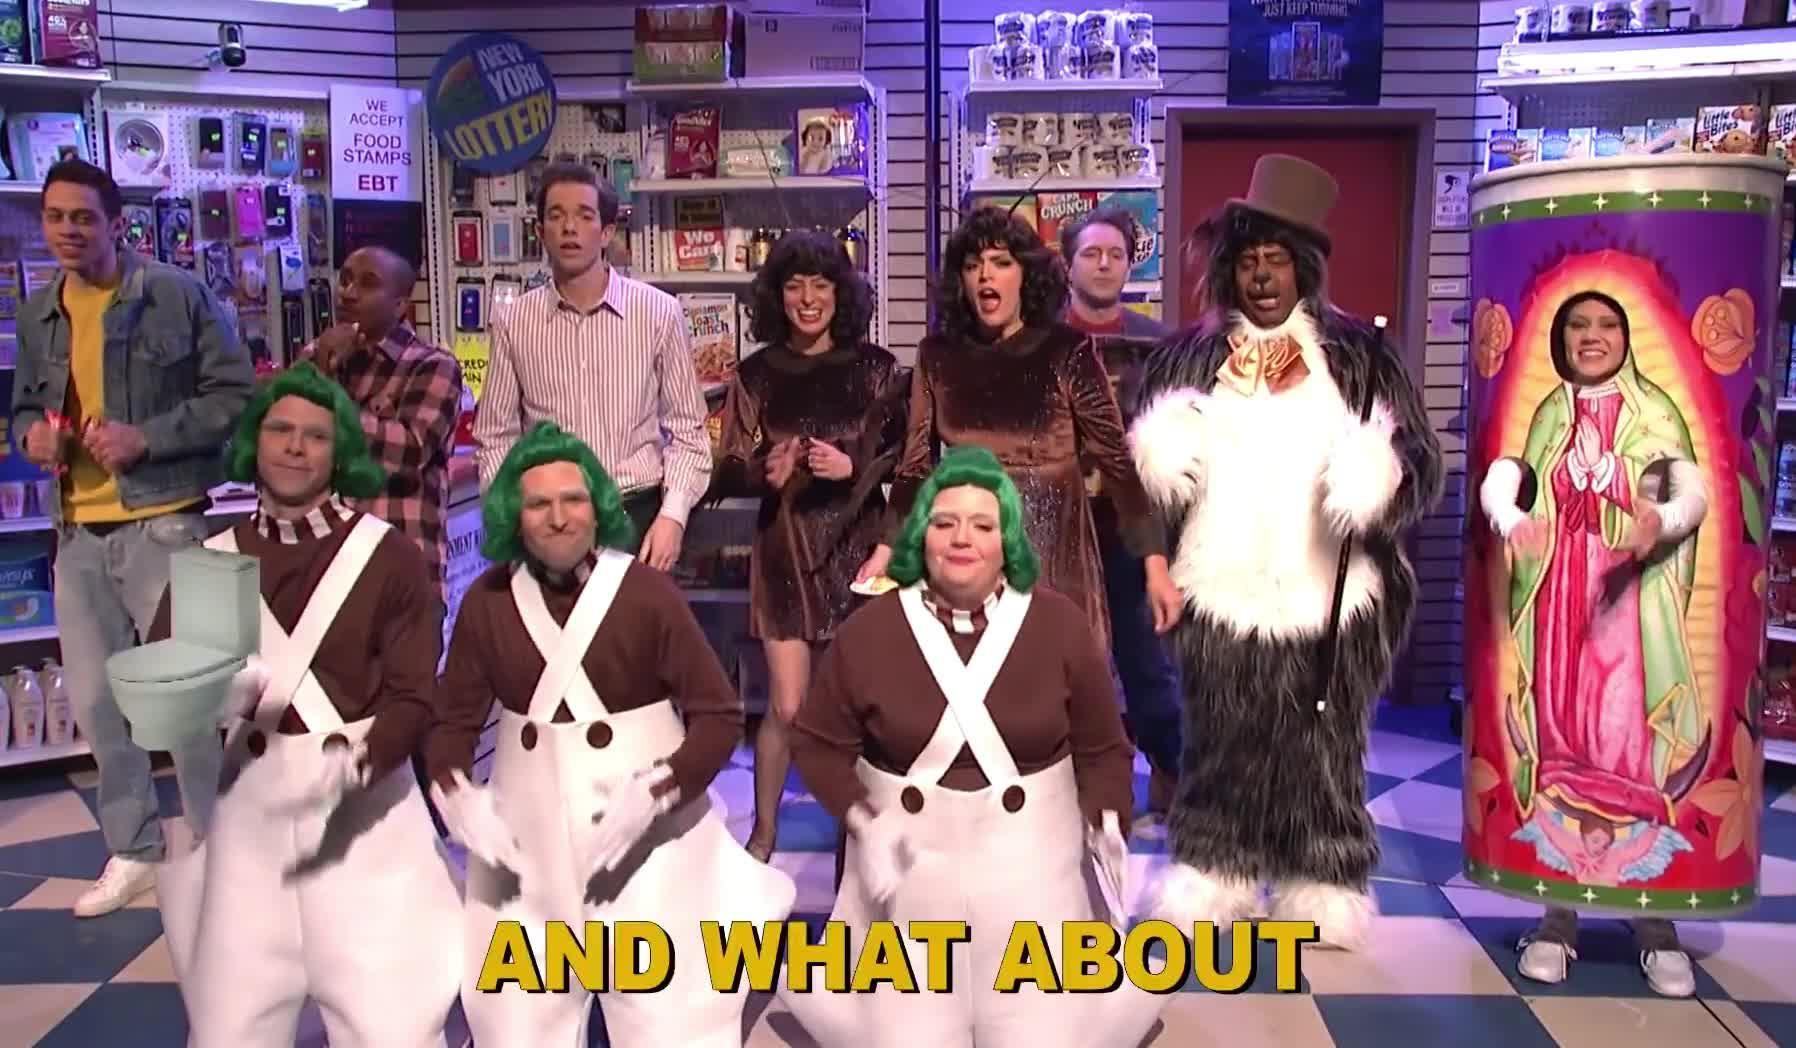 about, bathroom, bodega, cockroach, dirty, epic, flan, funny, ha, haha, hilarious, live, lol, night, saturday, sing, snl, song, toilet, what, Bodega Bathroom - SNL GIFs